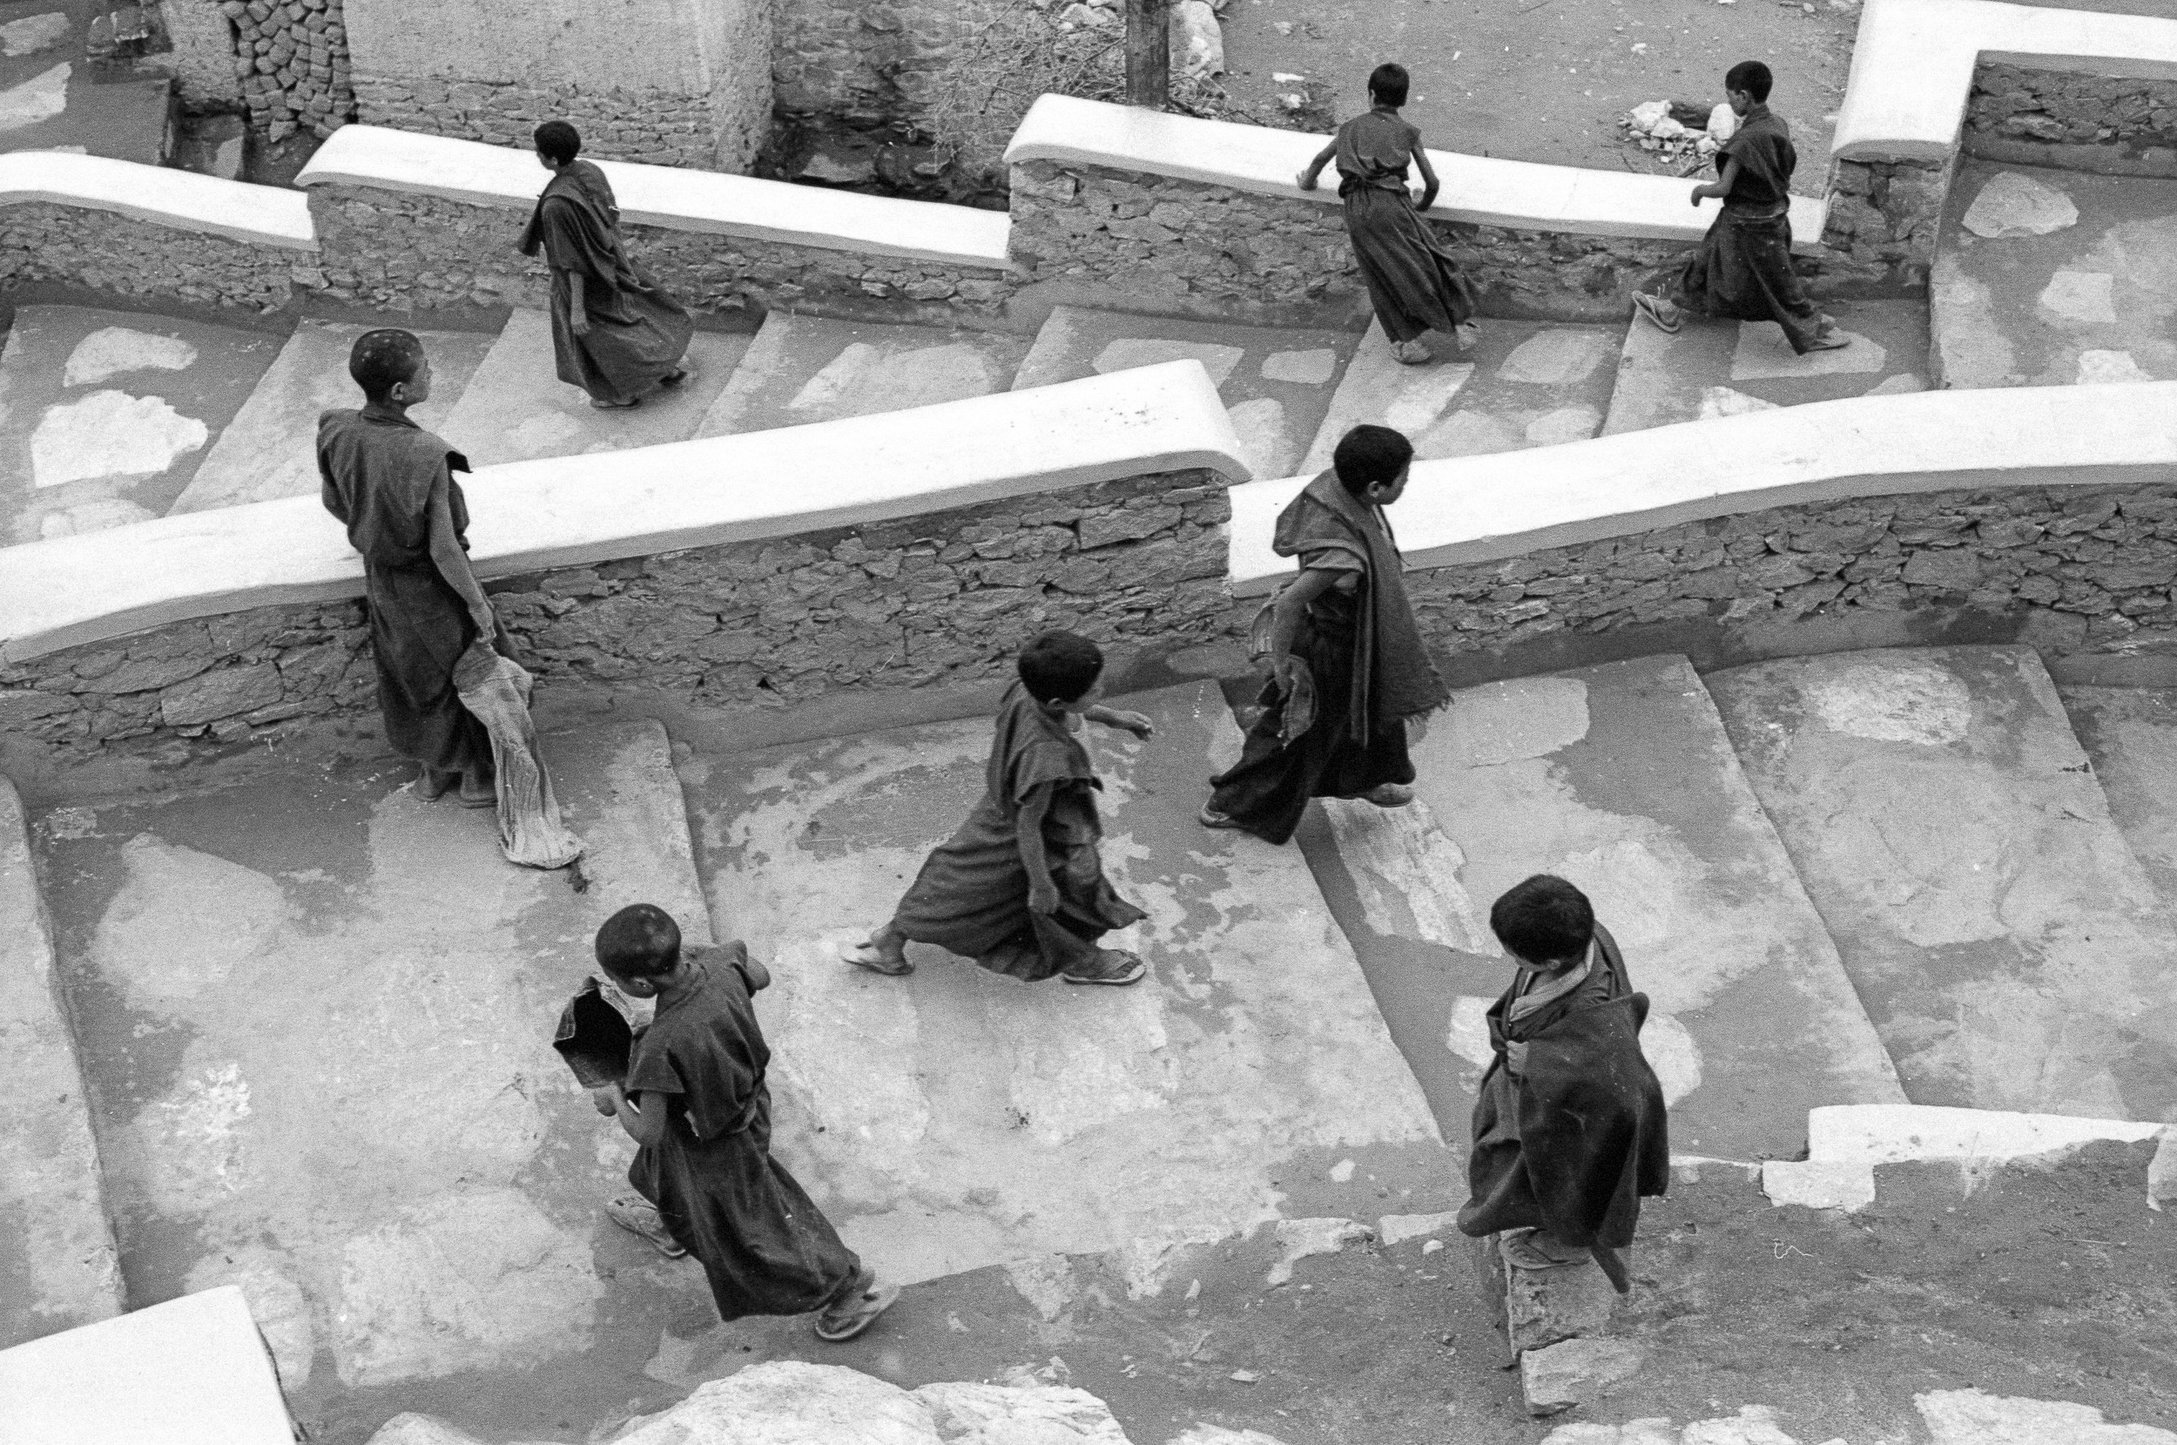 Shey, Ladakh, India, 1993